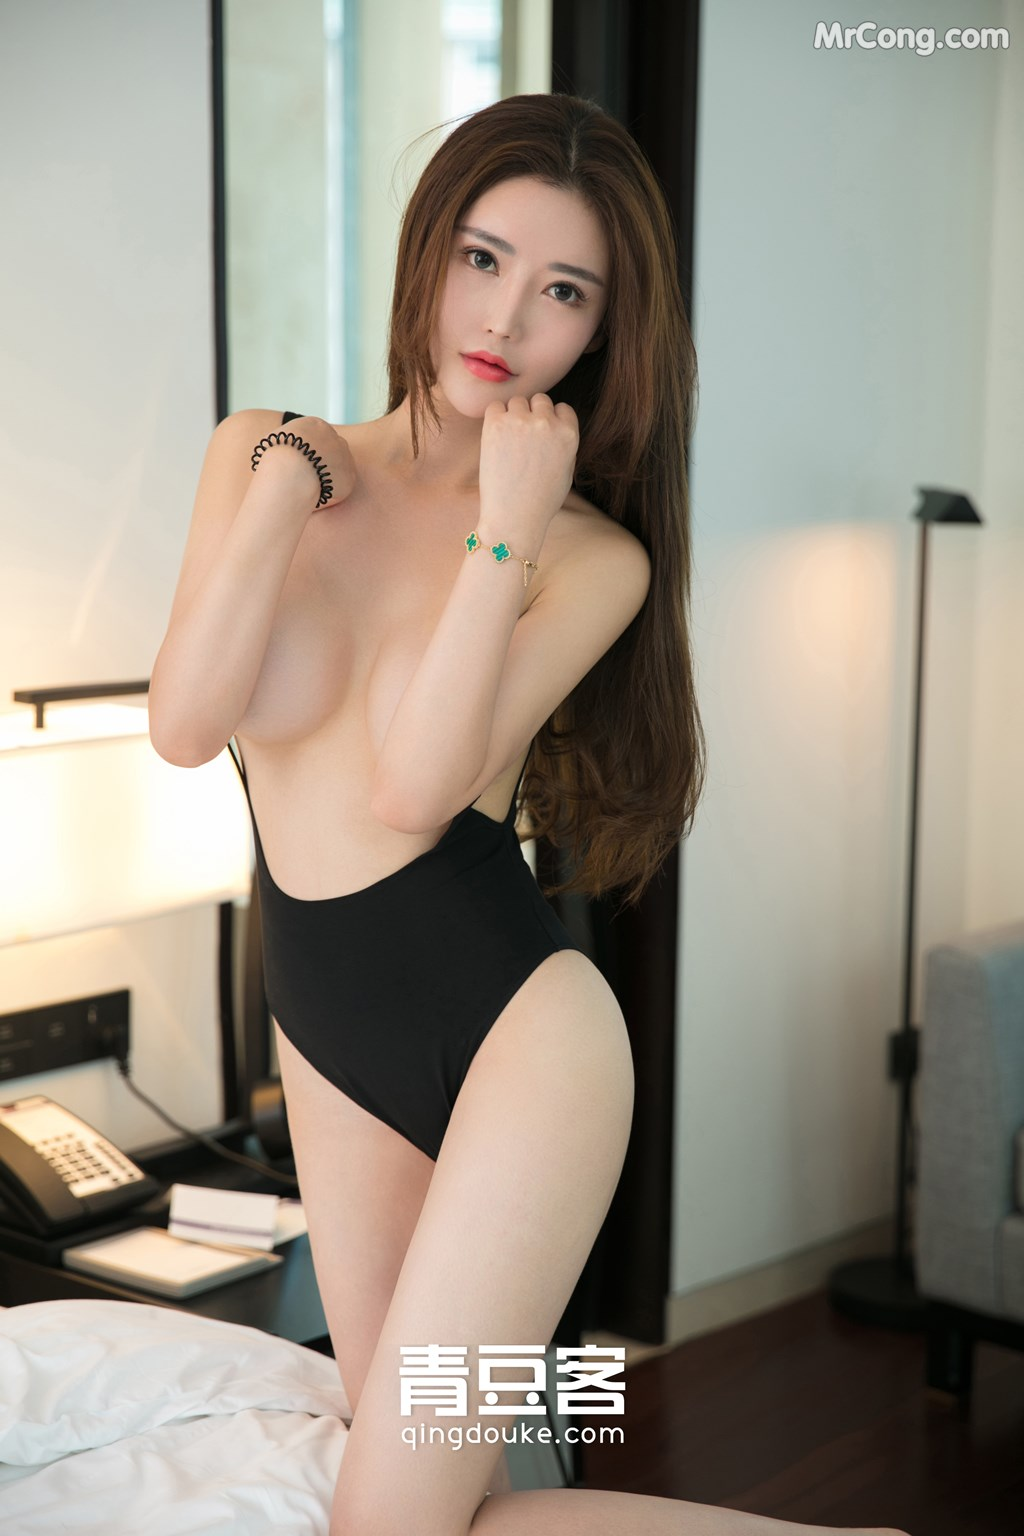 Image QingDouKe-2017-11-12-Tong-Man-MrCong.com-001 in post QingDouKe 2017-11-12: Người mẫu Tong Man (佟蔓) (50 ảnh)